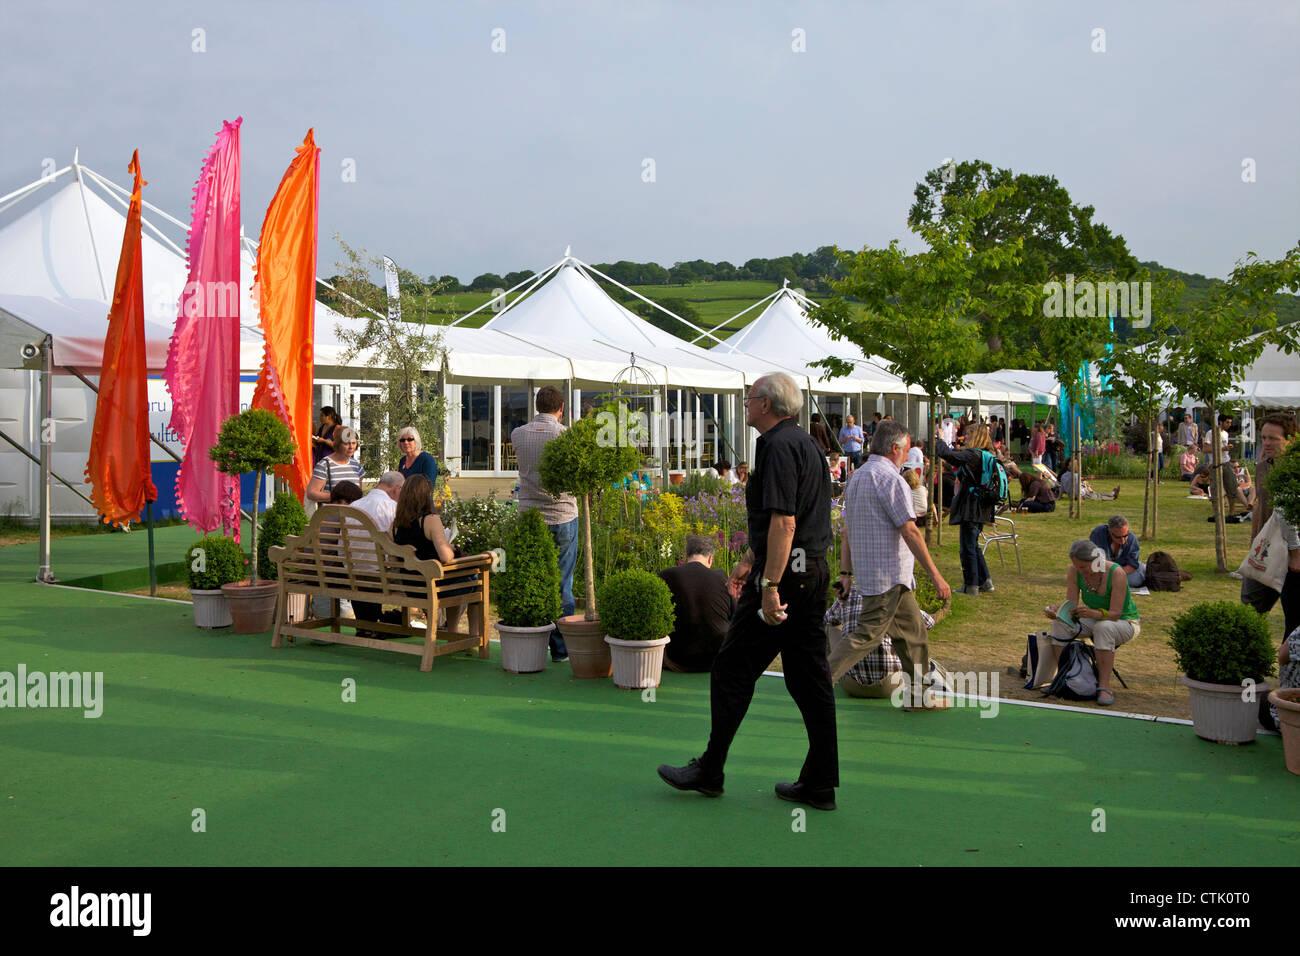 Jardin Central au Guardian Hay Festival de littérature 2010, Hay-on-Wye, Powys, Pays de Galles, Cymru, UK, Photo Stock